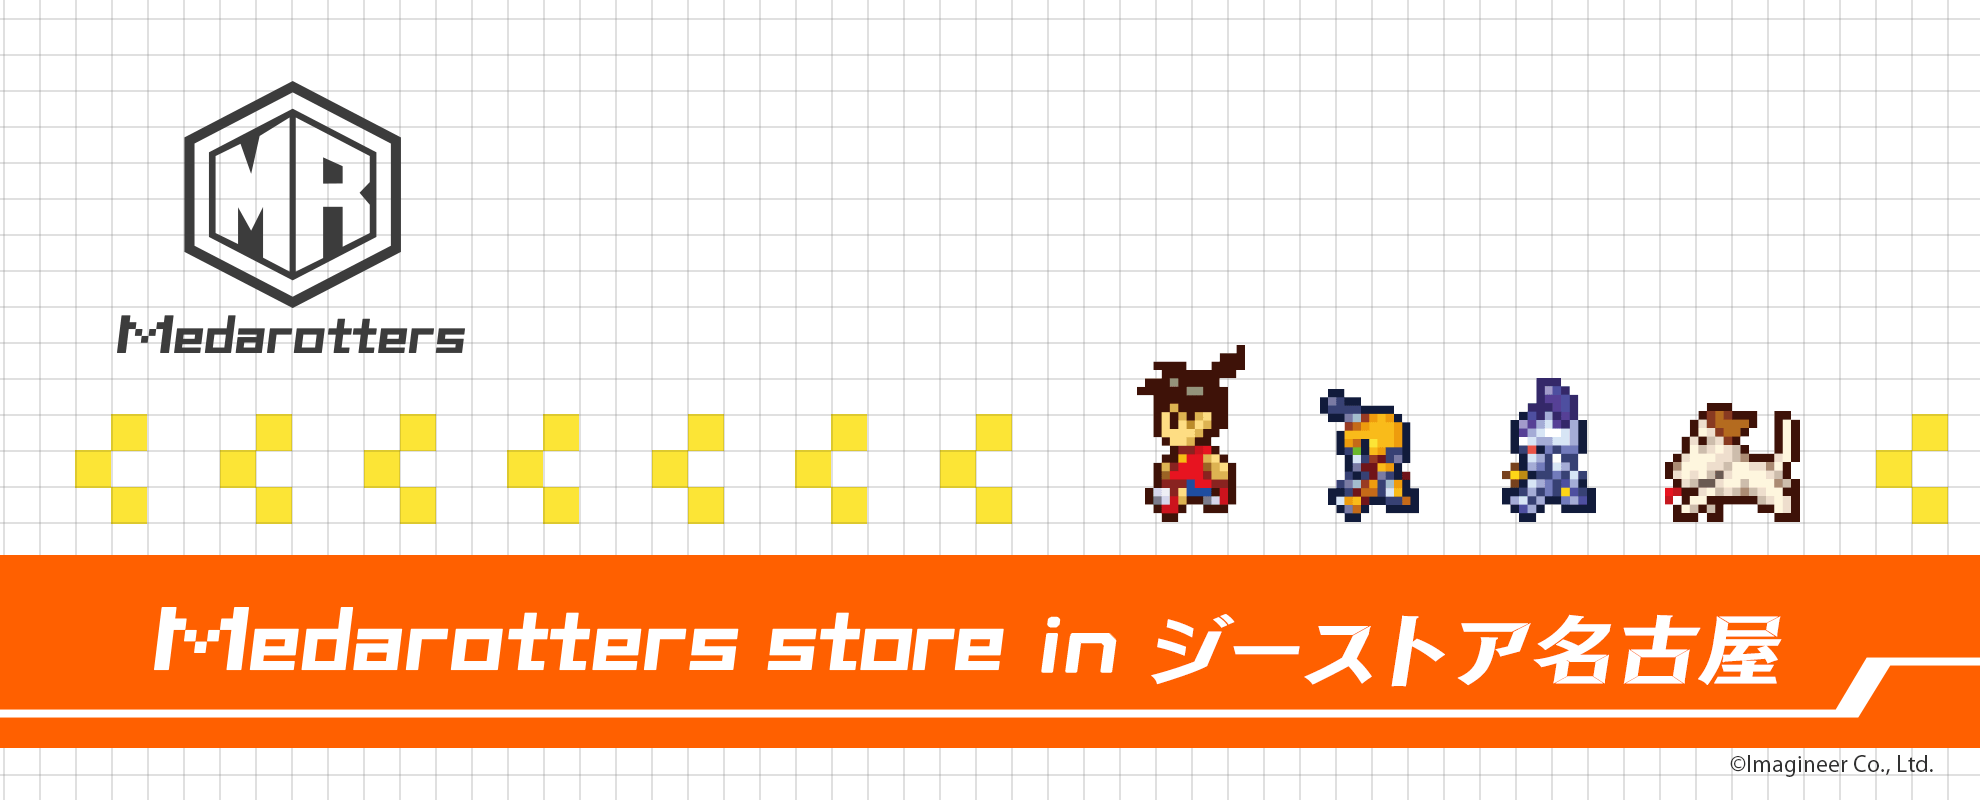 Medarotters store in ジーストア名古屋(監修用)